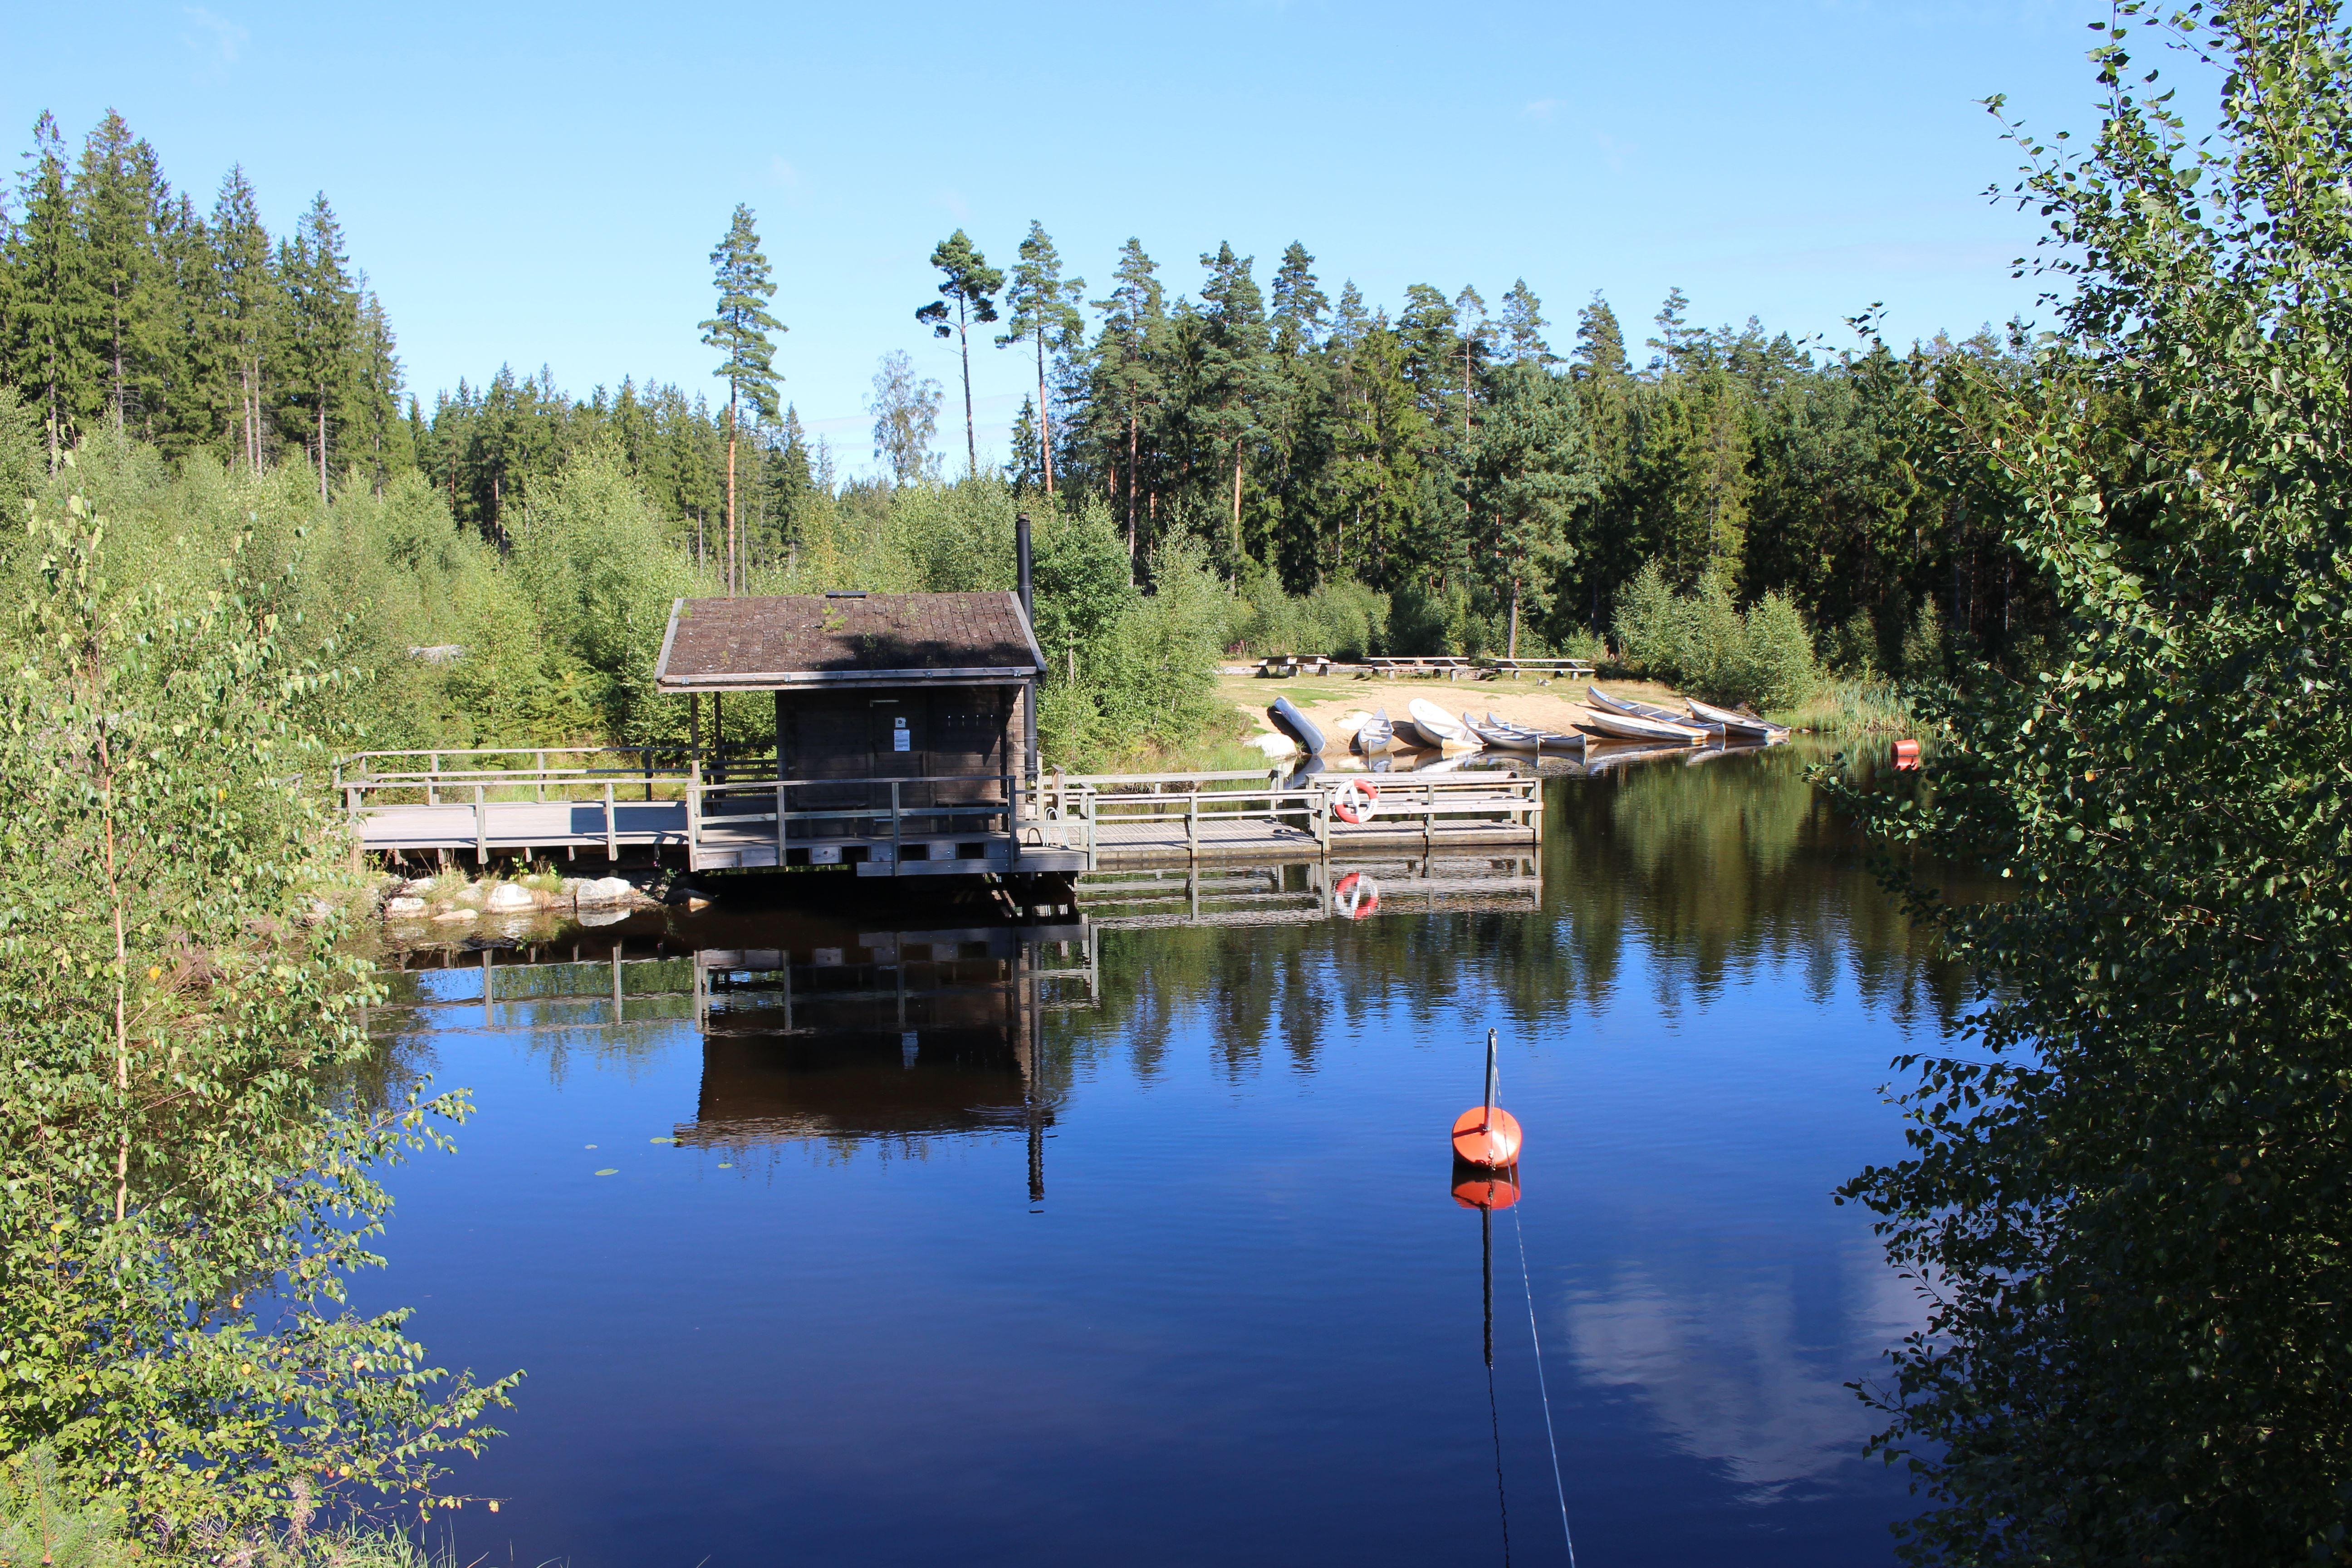 Johan Söderlund,  © Tingsryds kommun, Hätteboda Wild-Camping - SCR VM